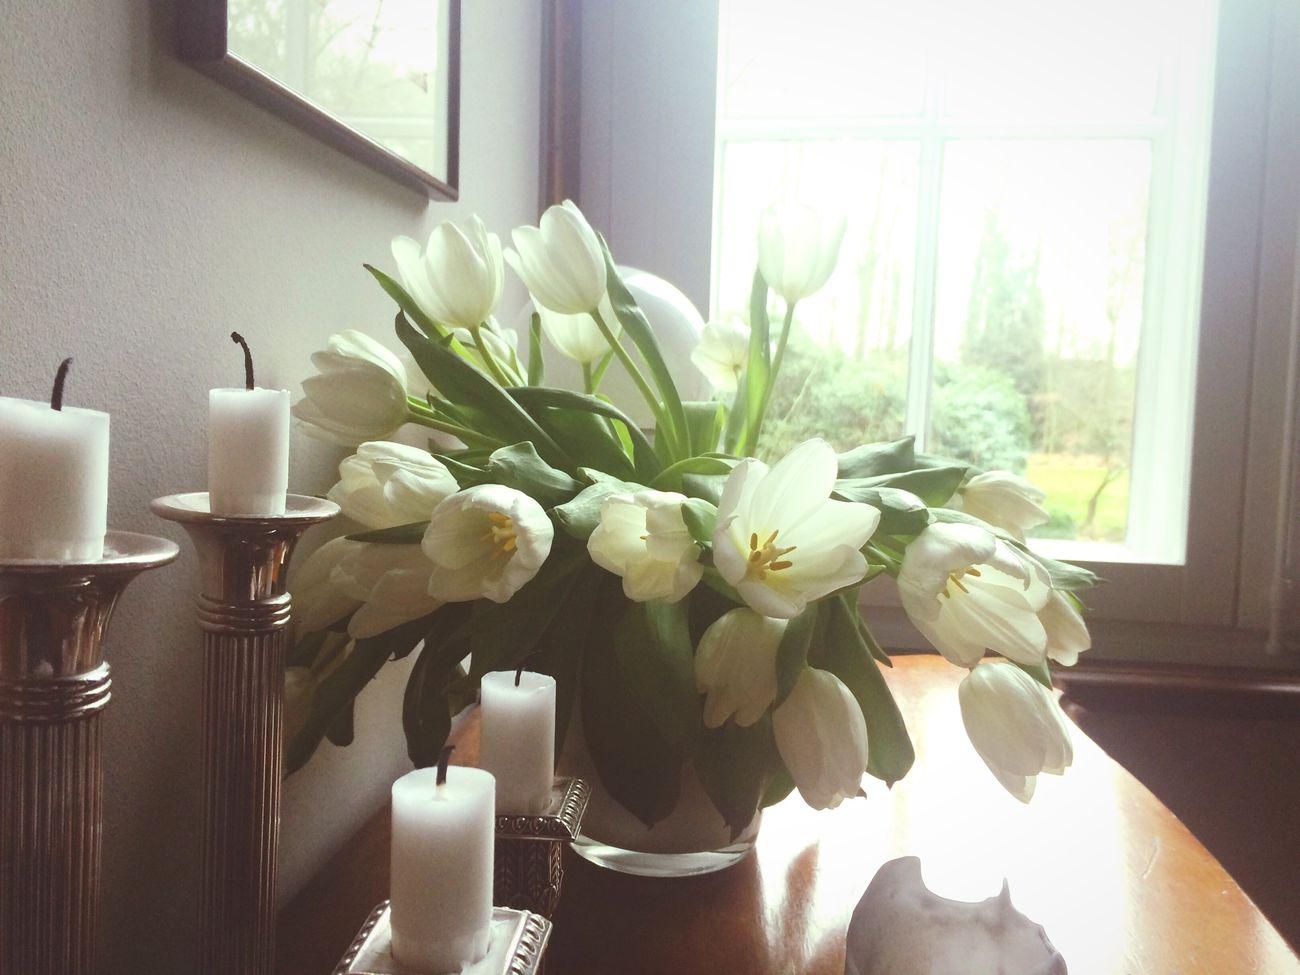 Радуют цветочки Tulips Flower Tulip Beautiful Beauty Nature Flowers House Cosy Cosyhome Light First Eyeem Photo